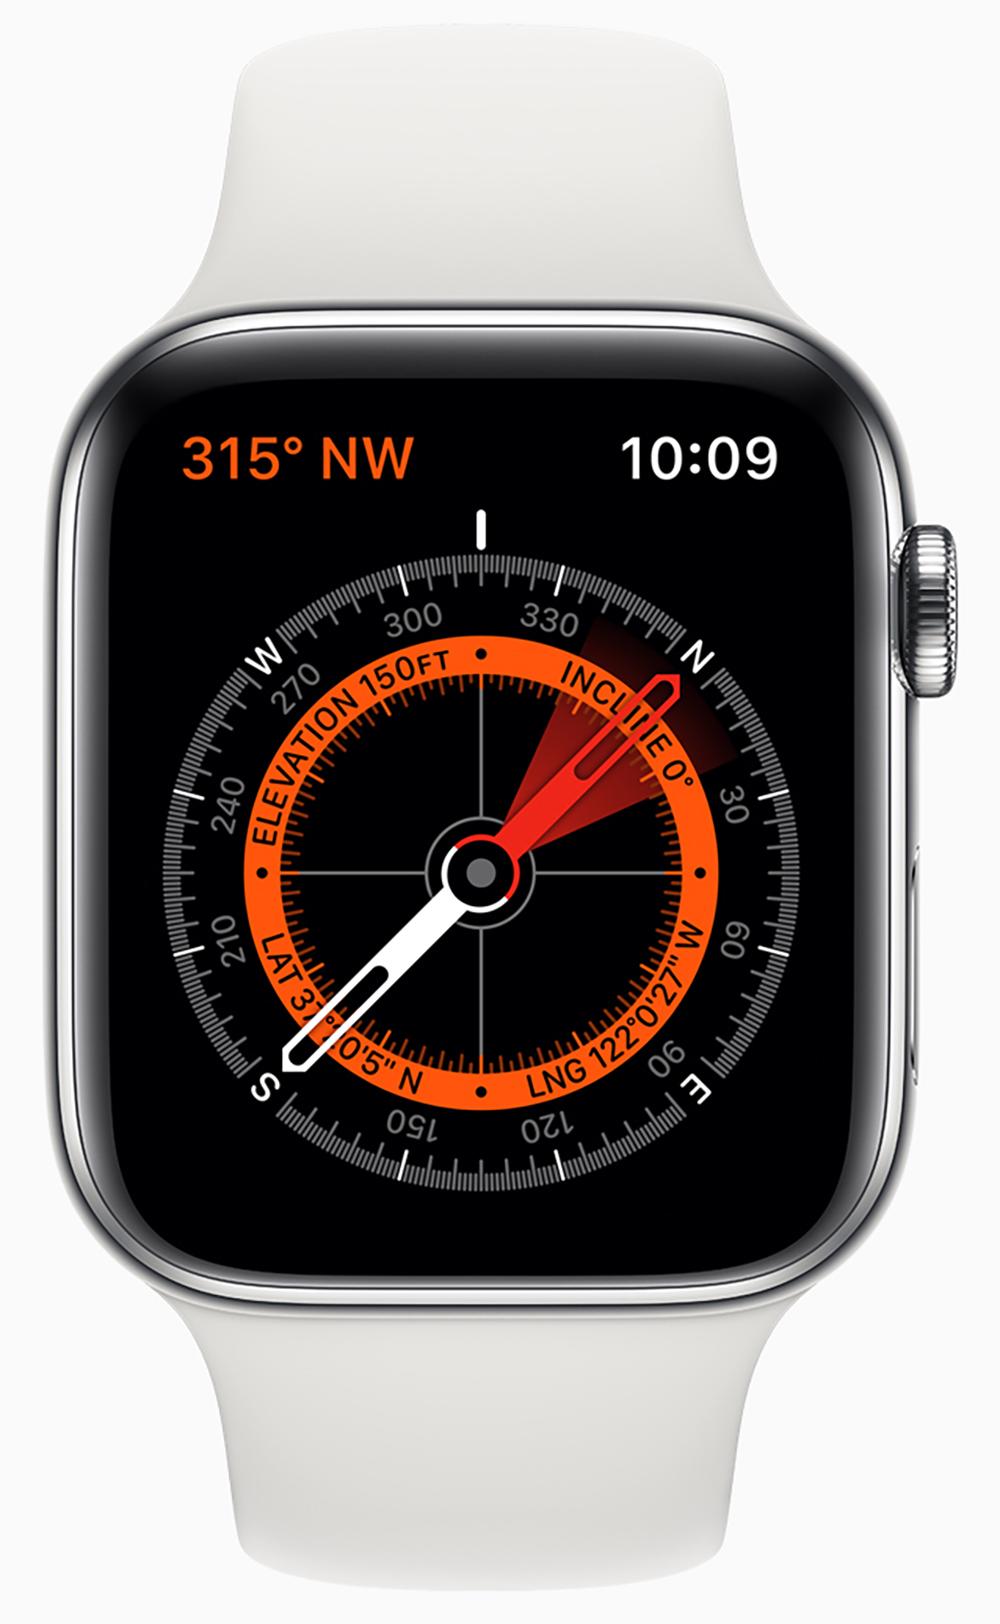 Kompass App der neuen Apple Watch 5